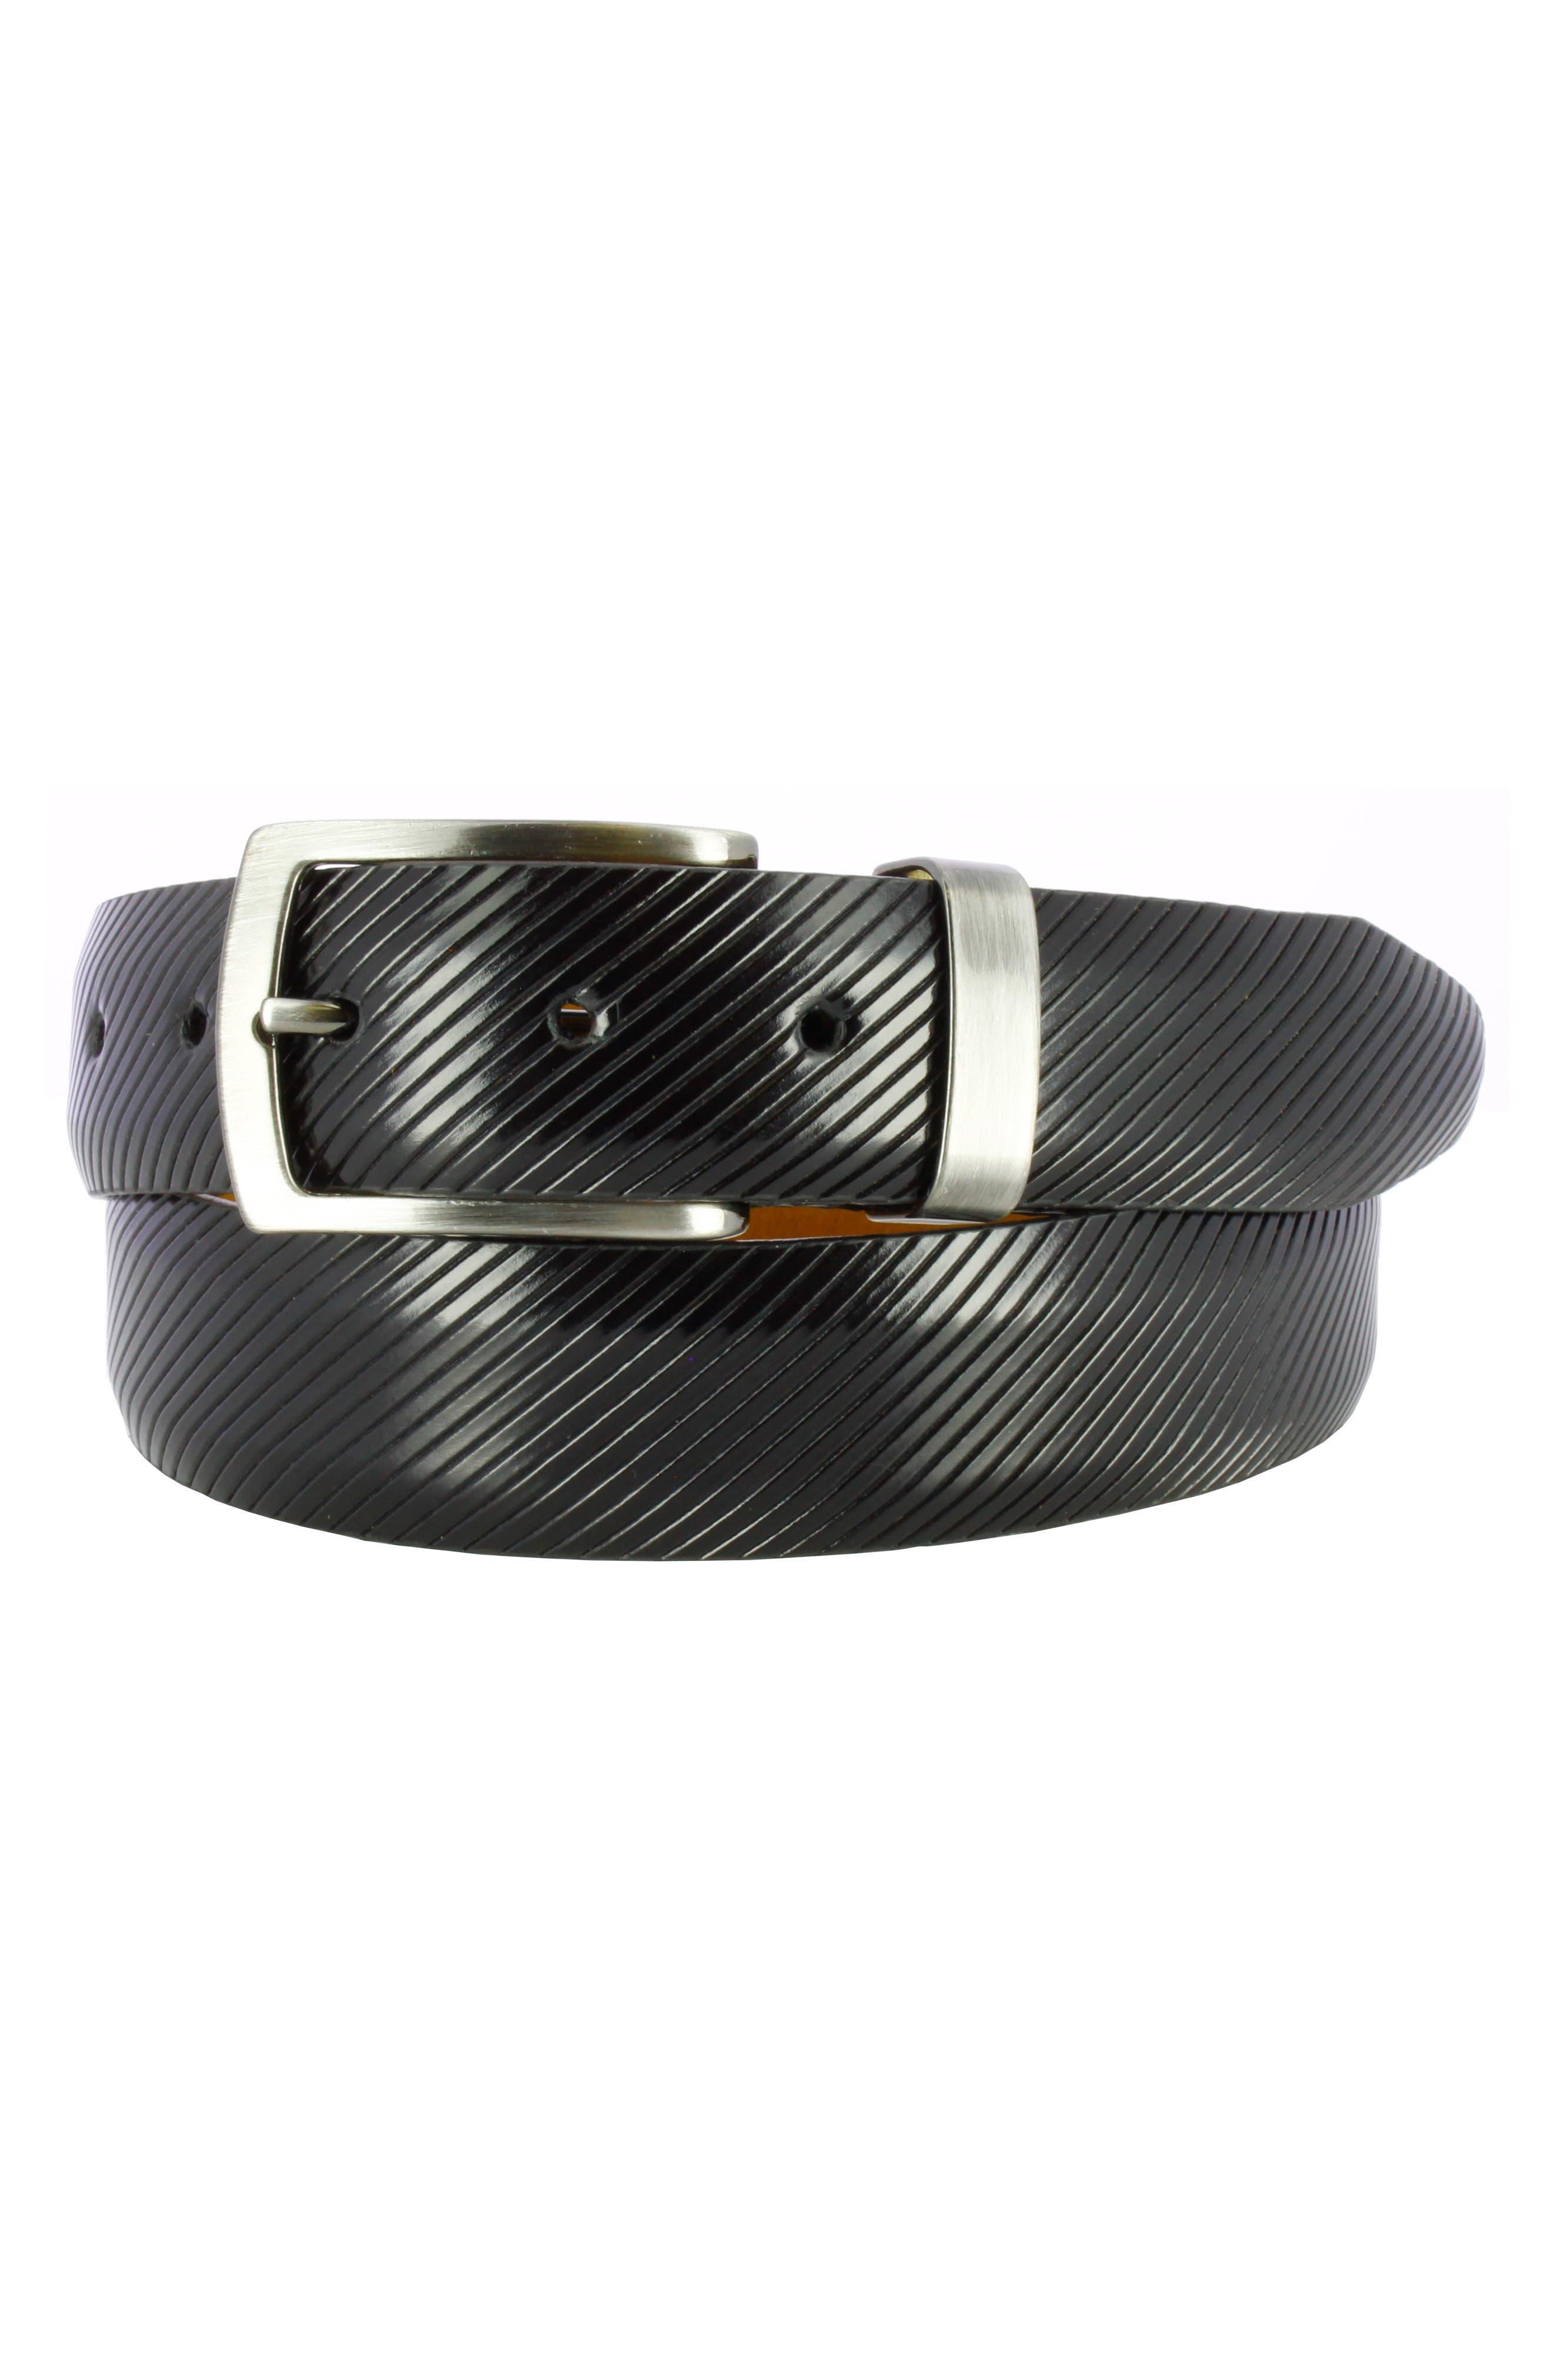 Remo Tulliani Sylvio Millerighe Leather Belt